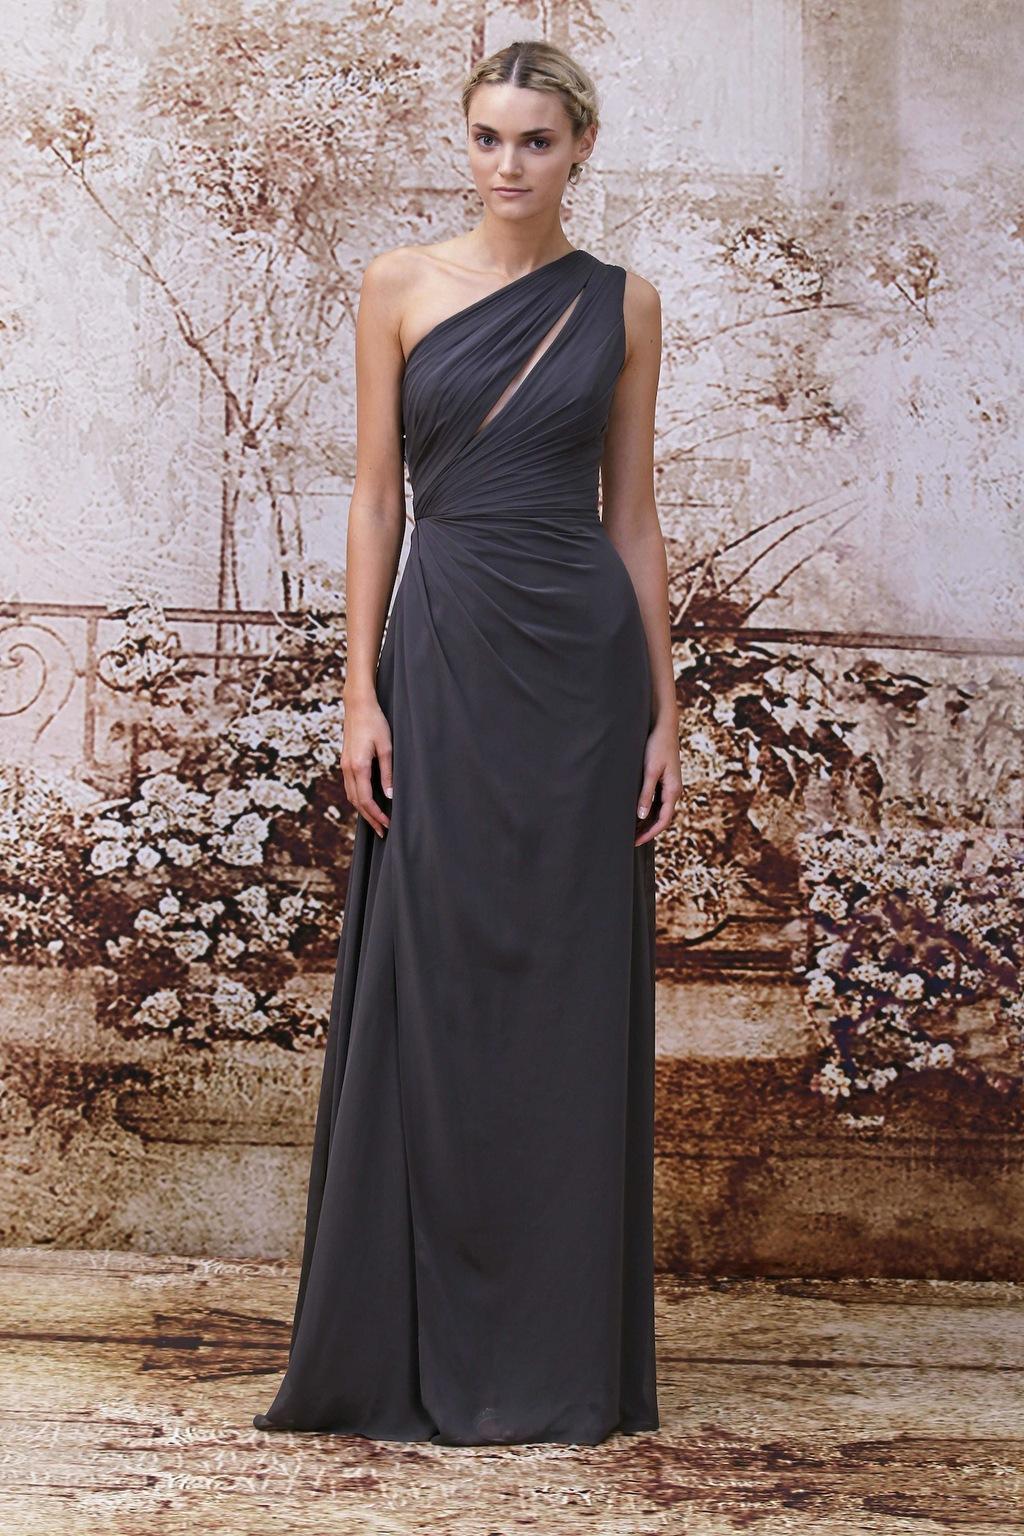 Slate_bridesmaids_dress_from_monique_lhuillier.full